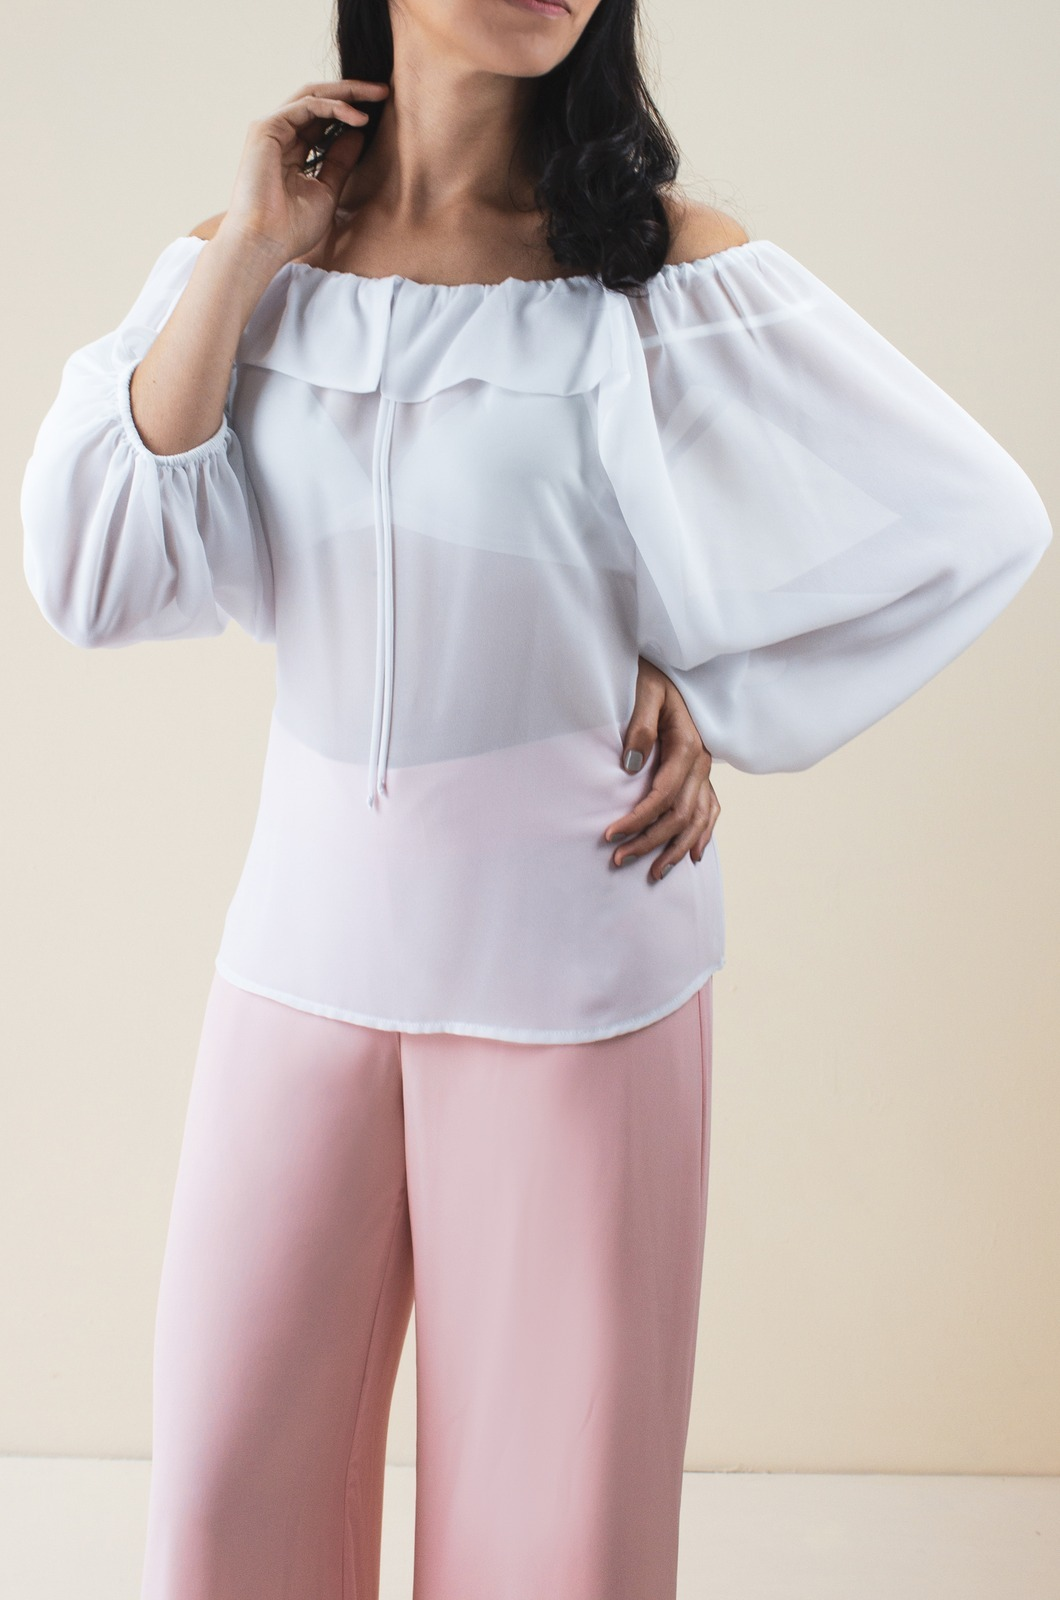 Blusa campesina con boleros y manga bombacha - Chazari 4017-20 Blanco